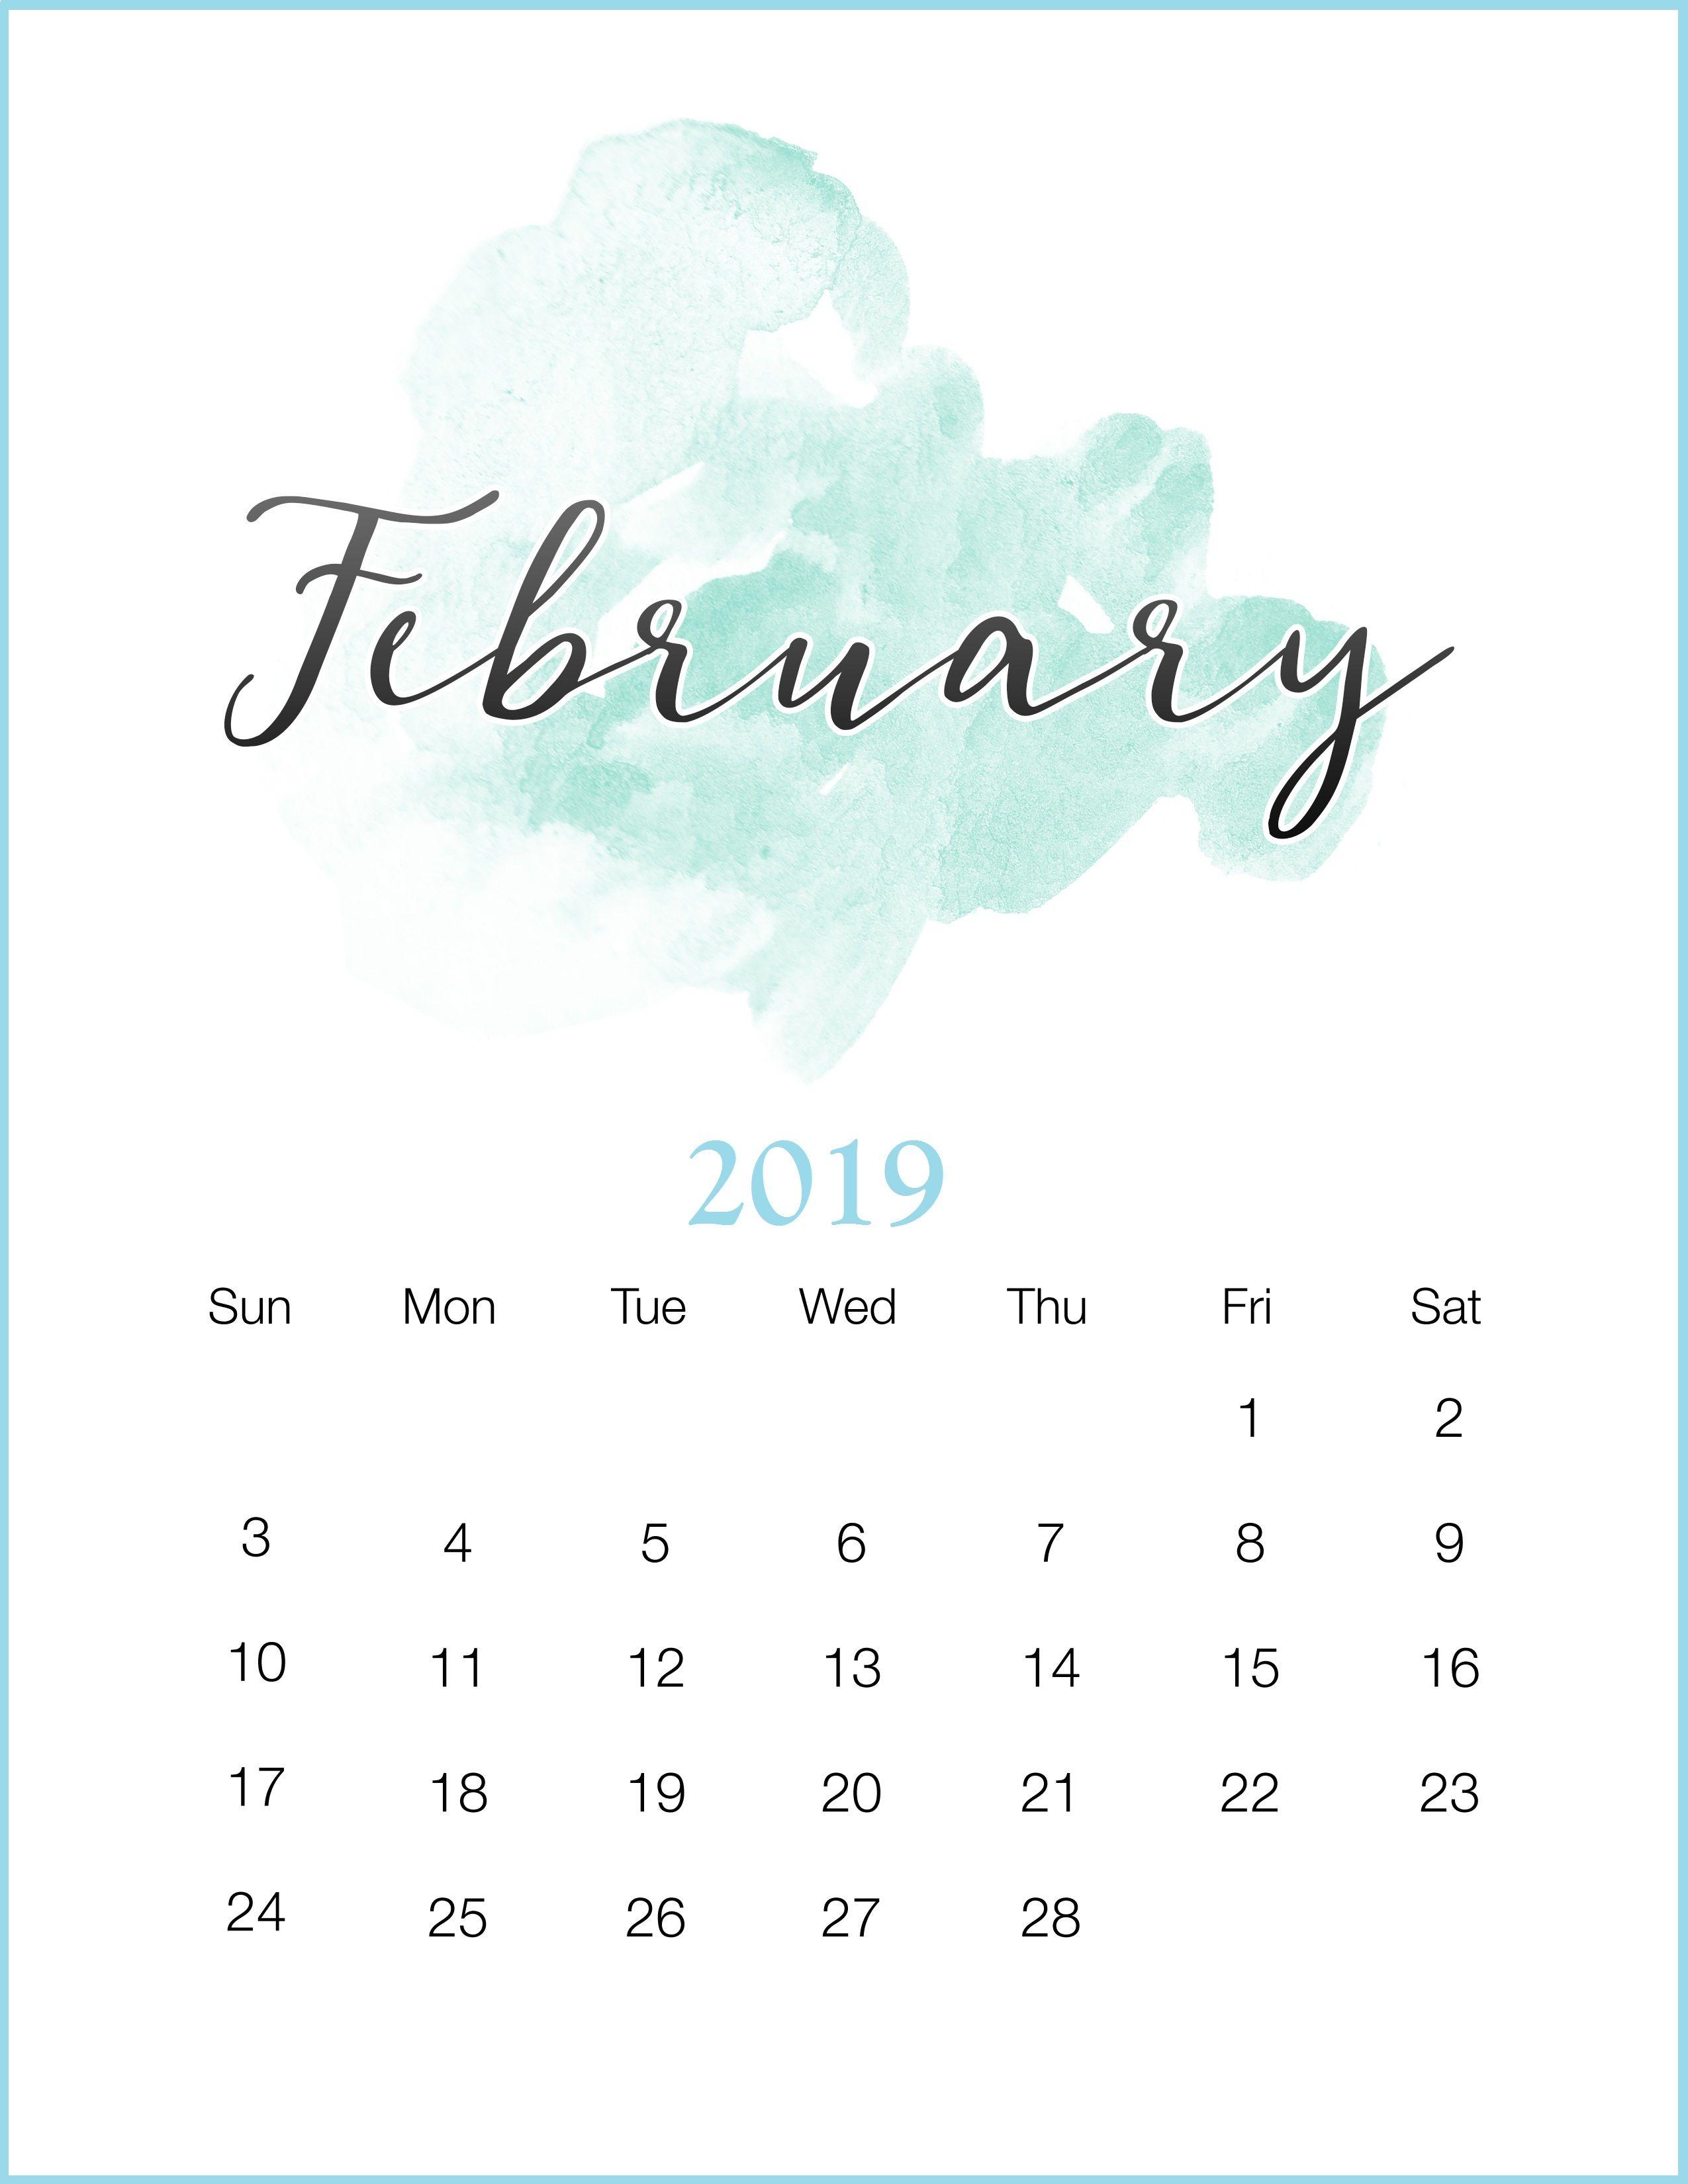 Watercolor 2019 Monthly Printable Calendar Pechatnye Kalendari